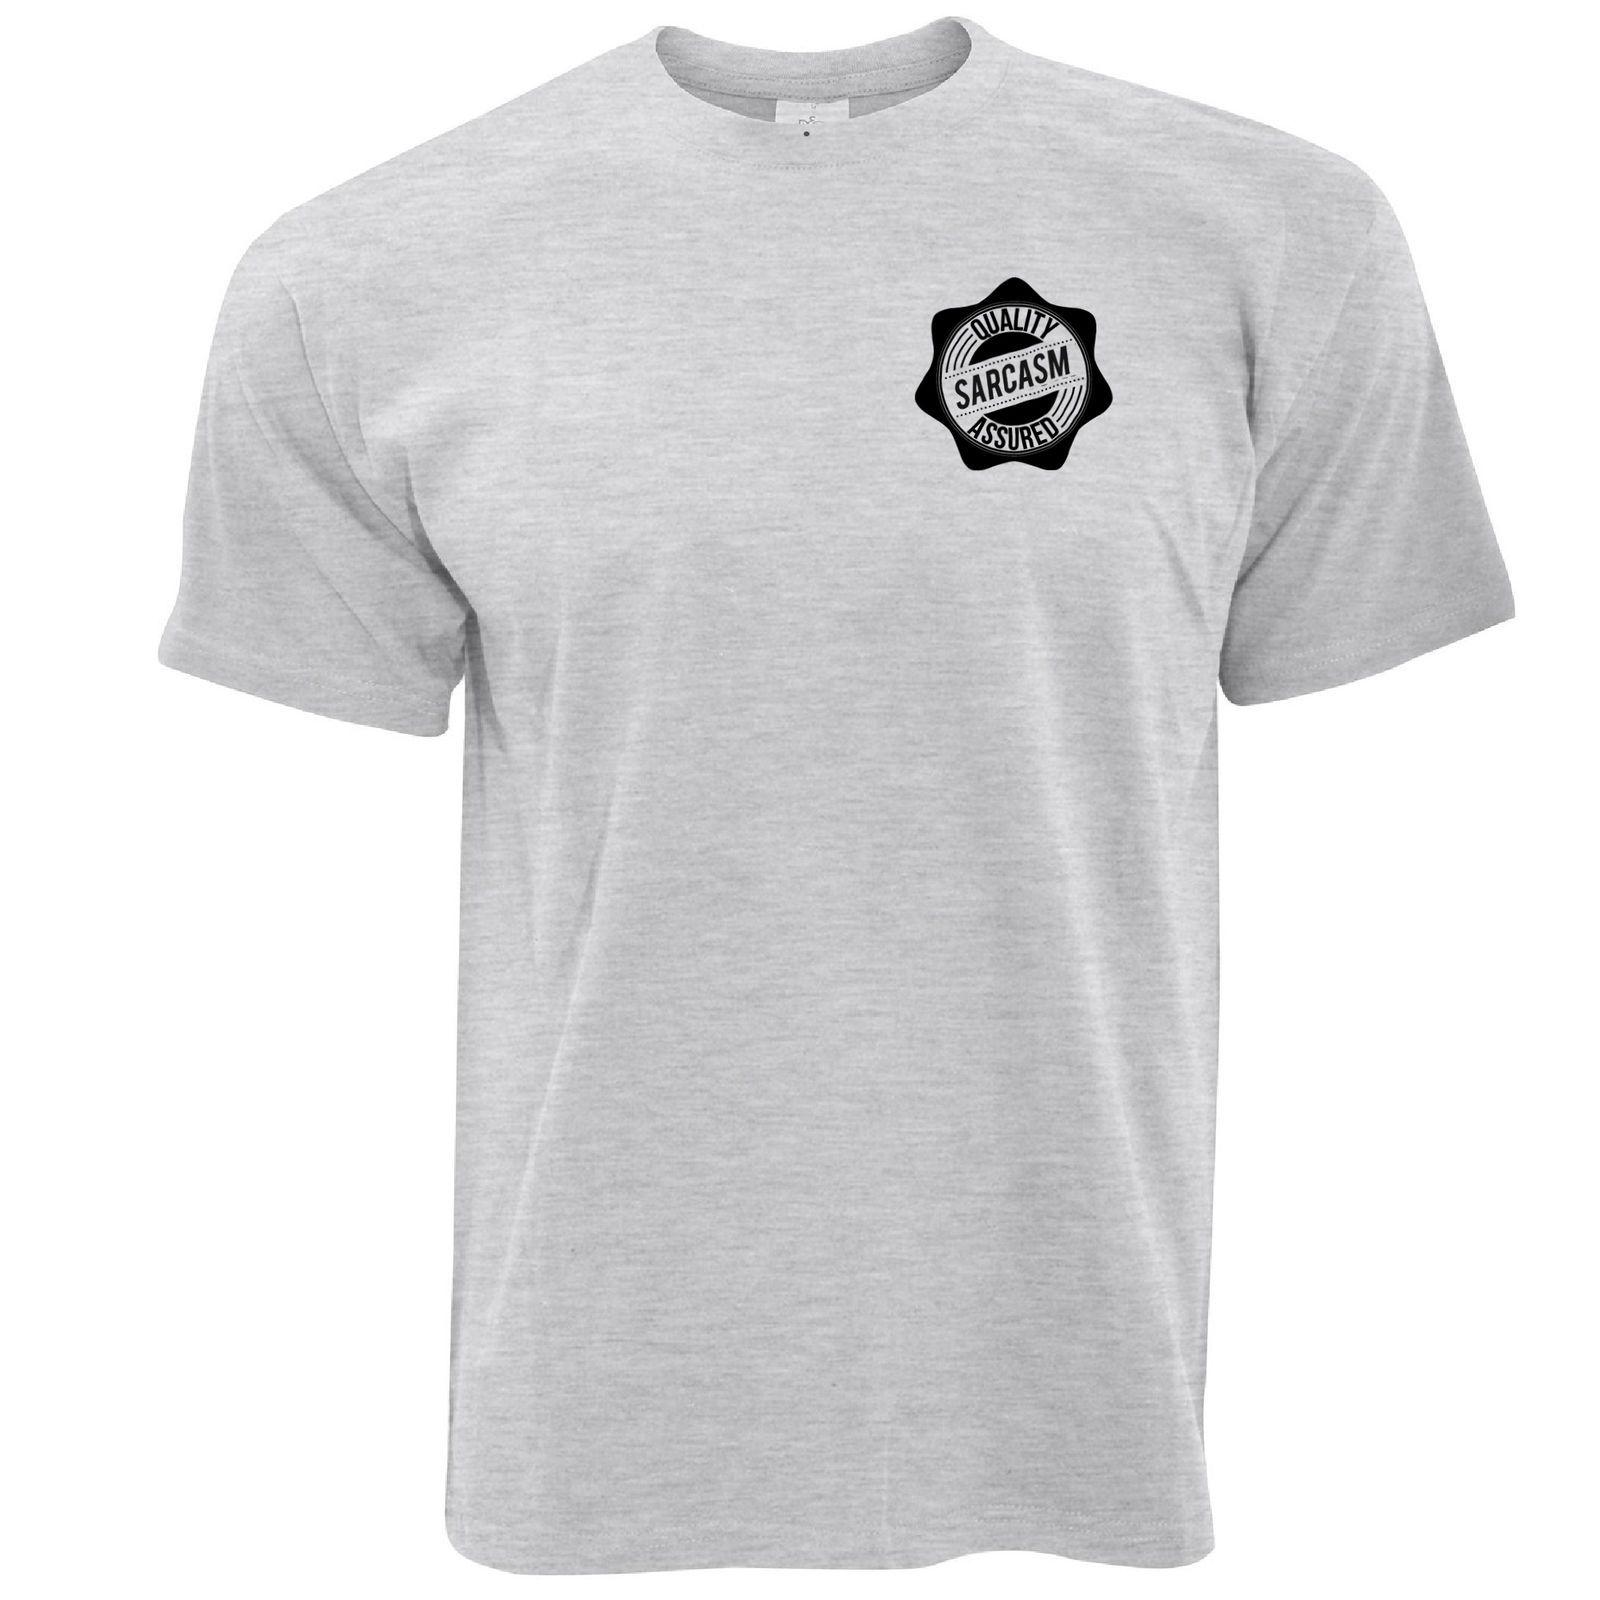 c2ac0758 Novelty Logo T Shirt Quality Sarcasm Assured Stamp Rude Joke Slogan 100%  Cotton Casual Printing Short Sleeve Men T Shirt O Neck Funky T Shirts For  Women T ...